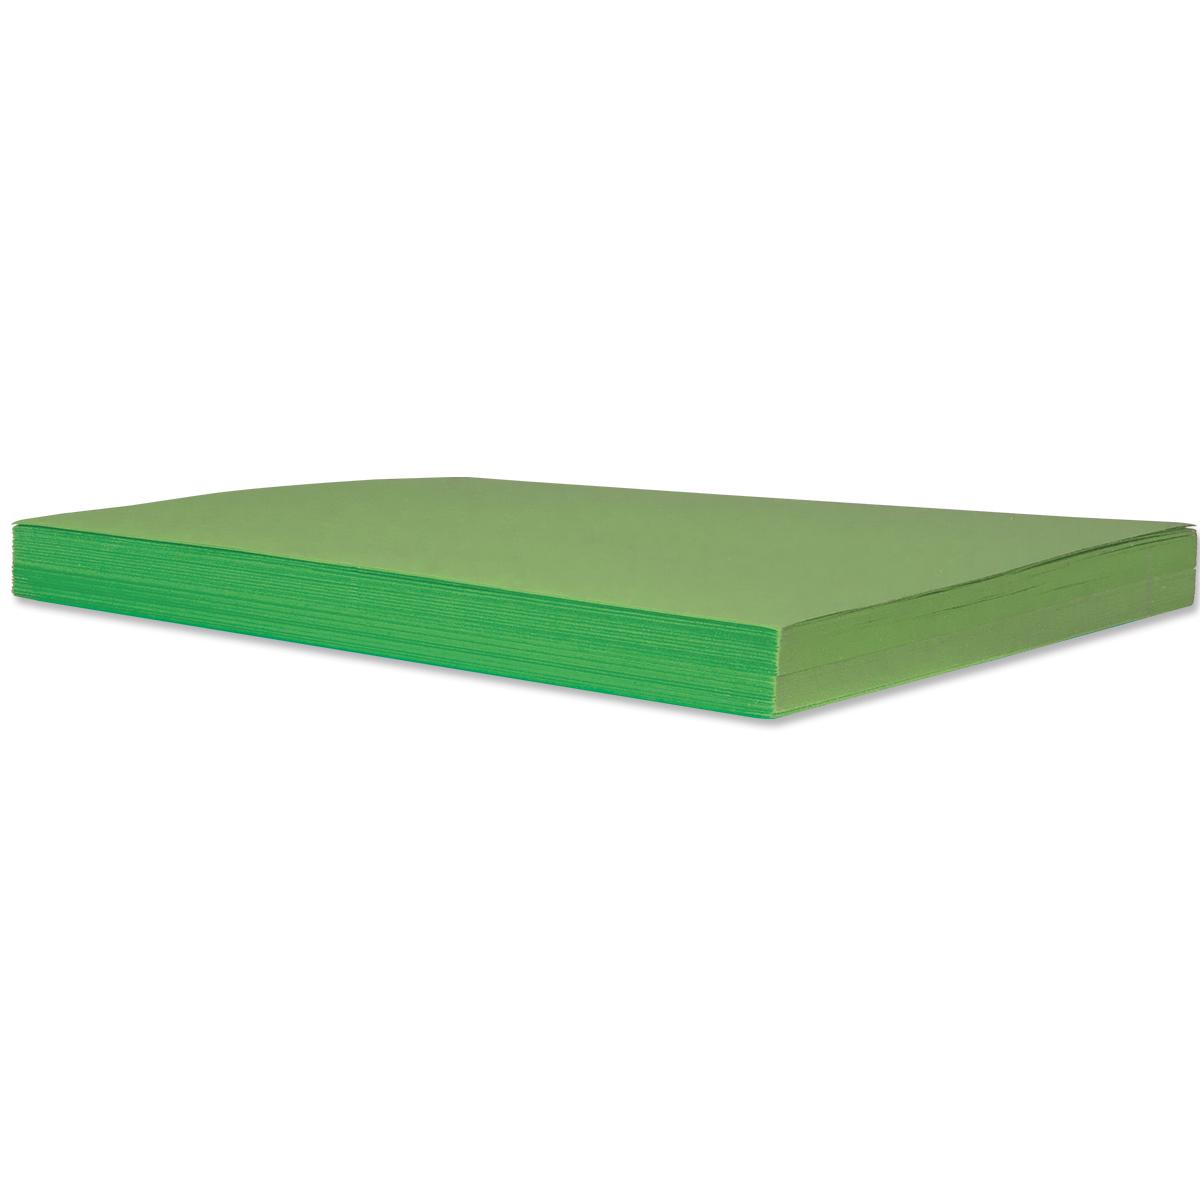 Construction Paper: Emerald Green